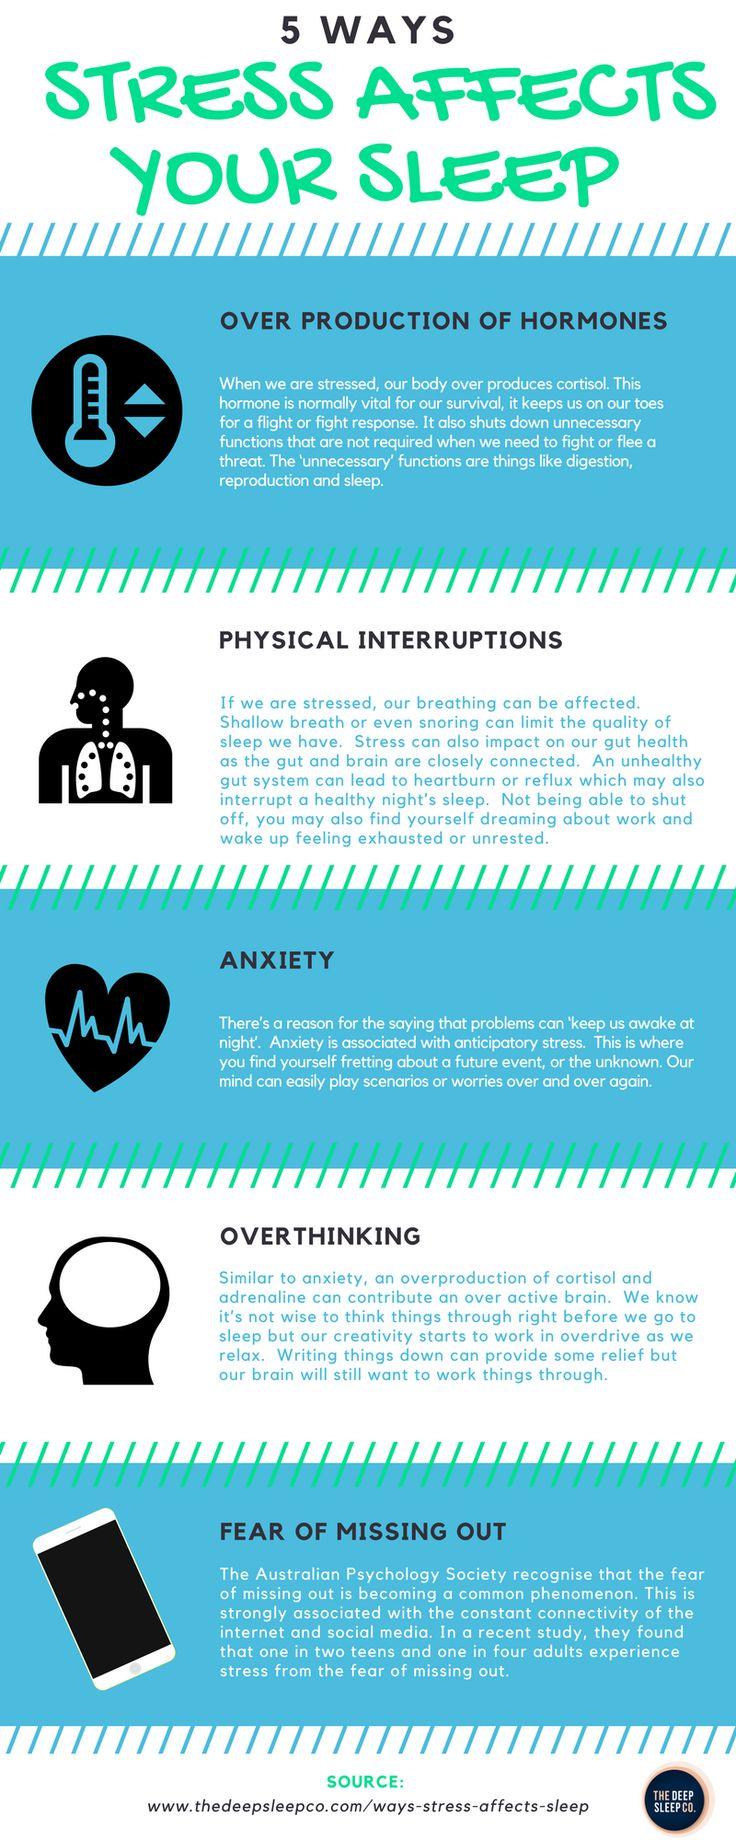 Ways that stress affects sleep. #stress #sleep